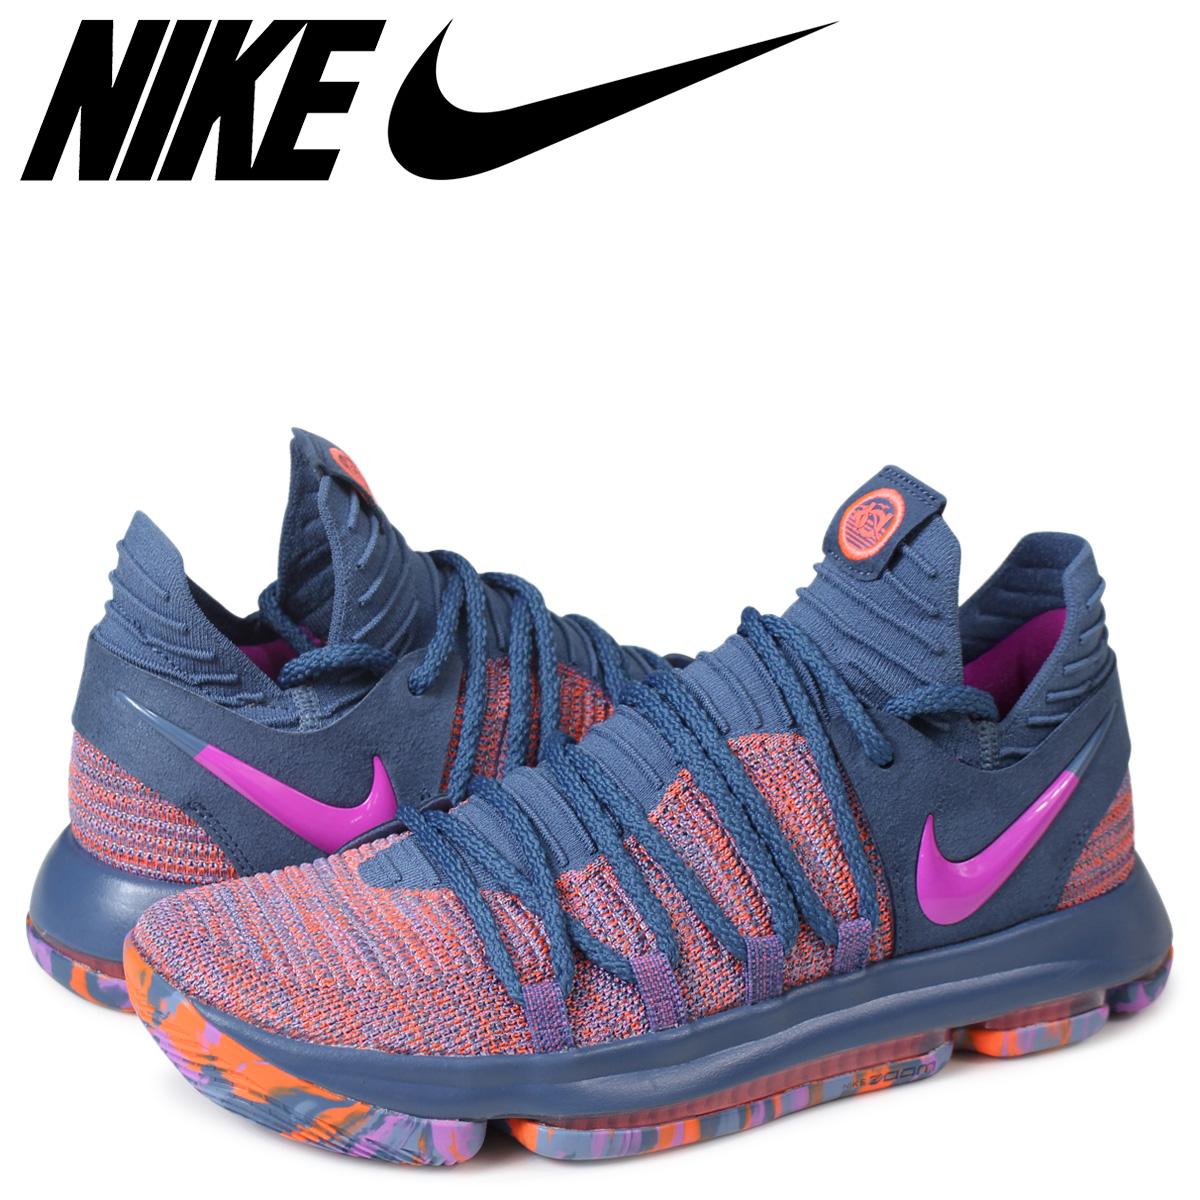 discount super cheap genuine shoes shop nike kd 10 purple norway 3b213 9cdb1